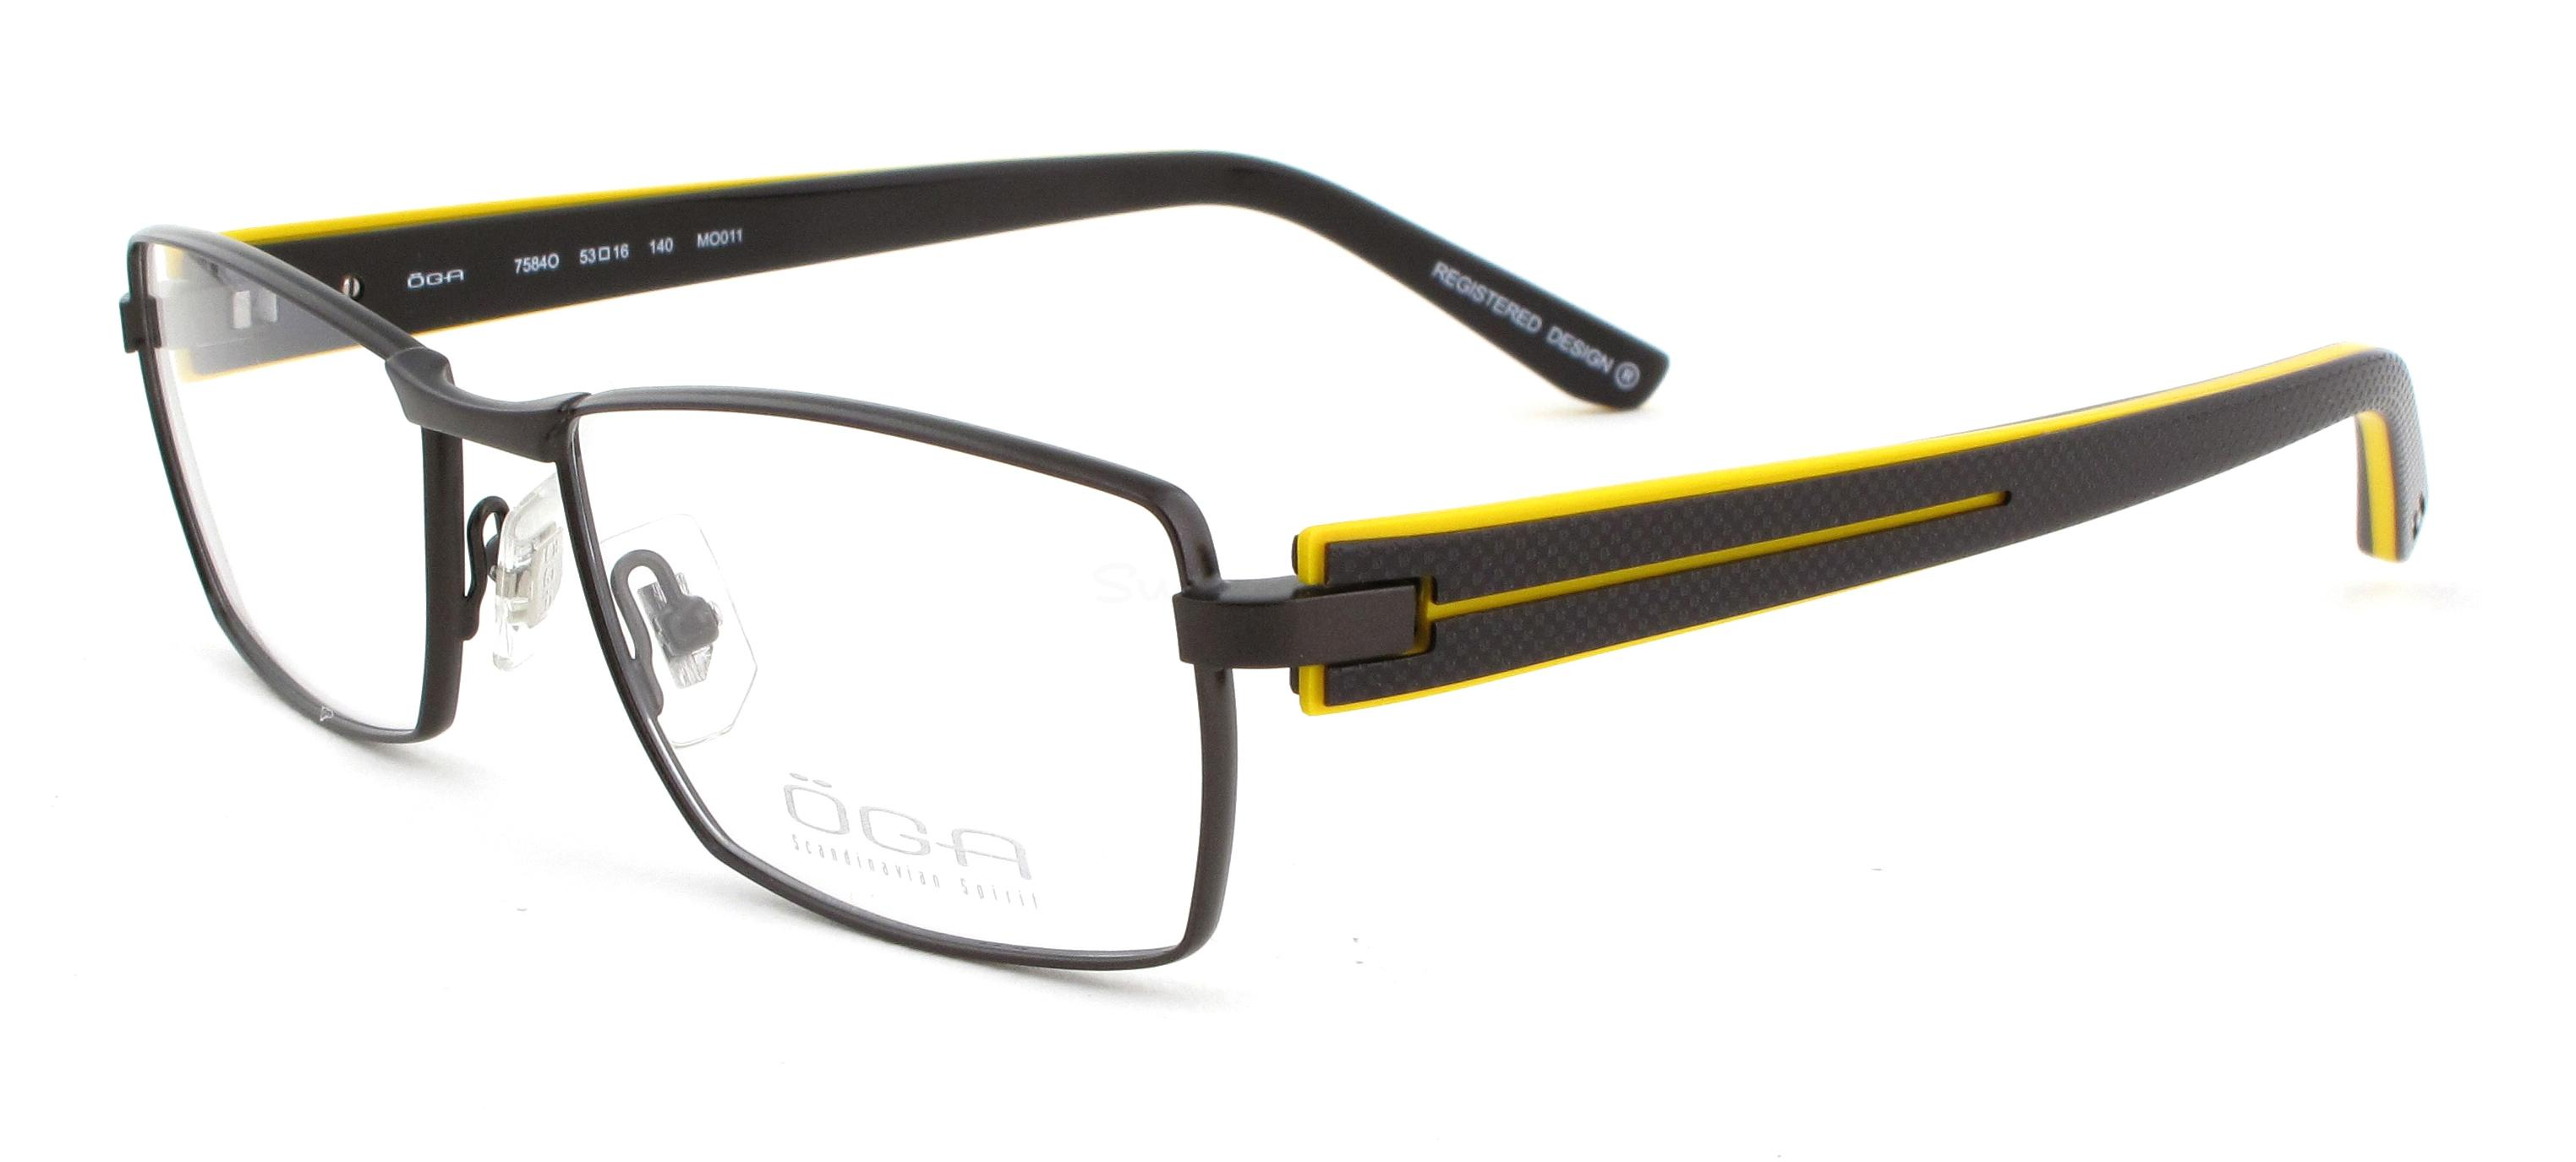 MO011 7584O TALVAC 2 Glasses, ÖGA Scandinavian Spirit